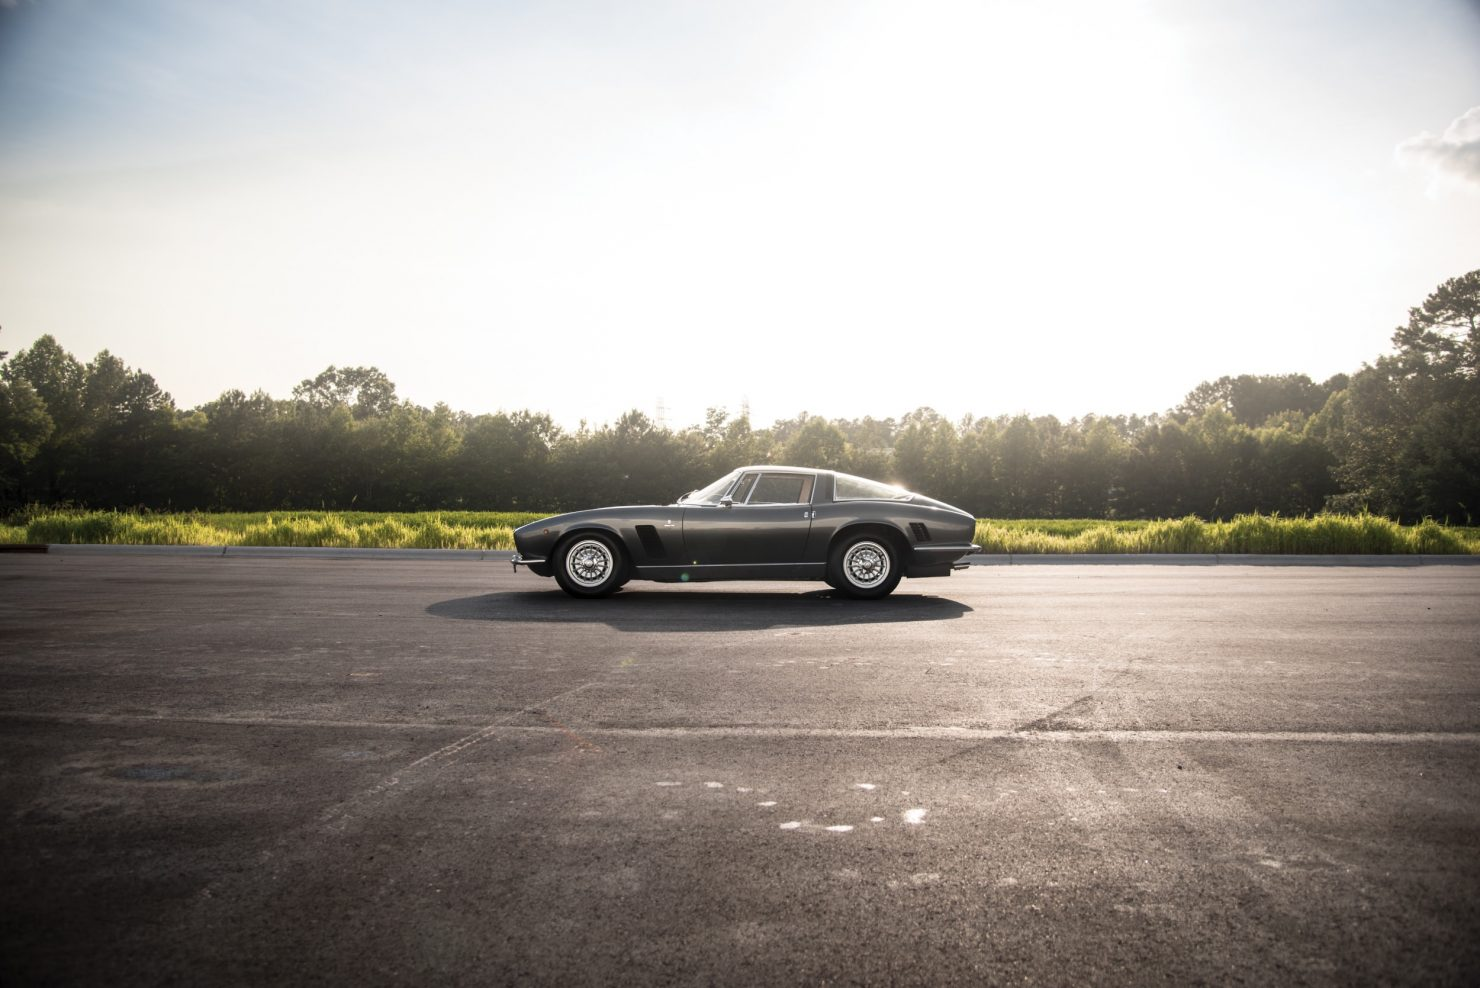 iso grifo car 5 1480x988 - 1966 Iso Grifo GL Series I